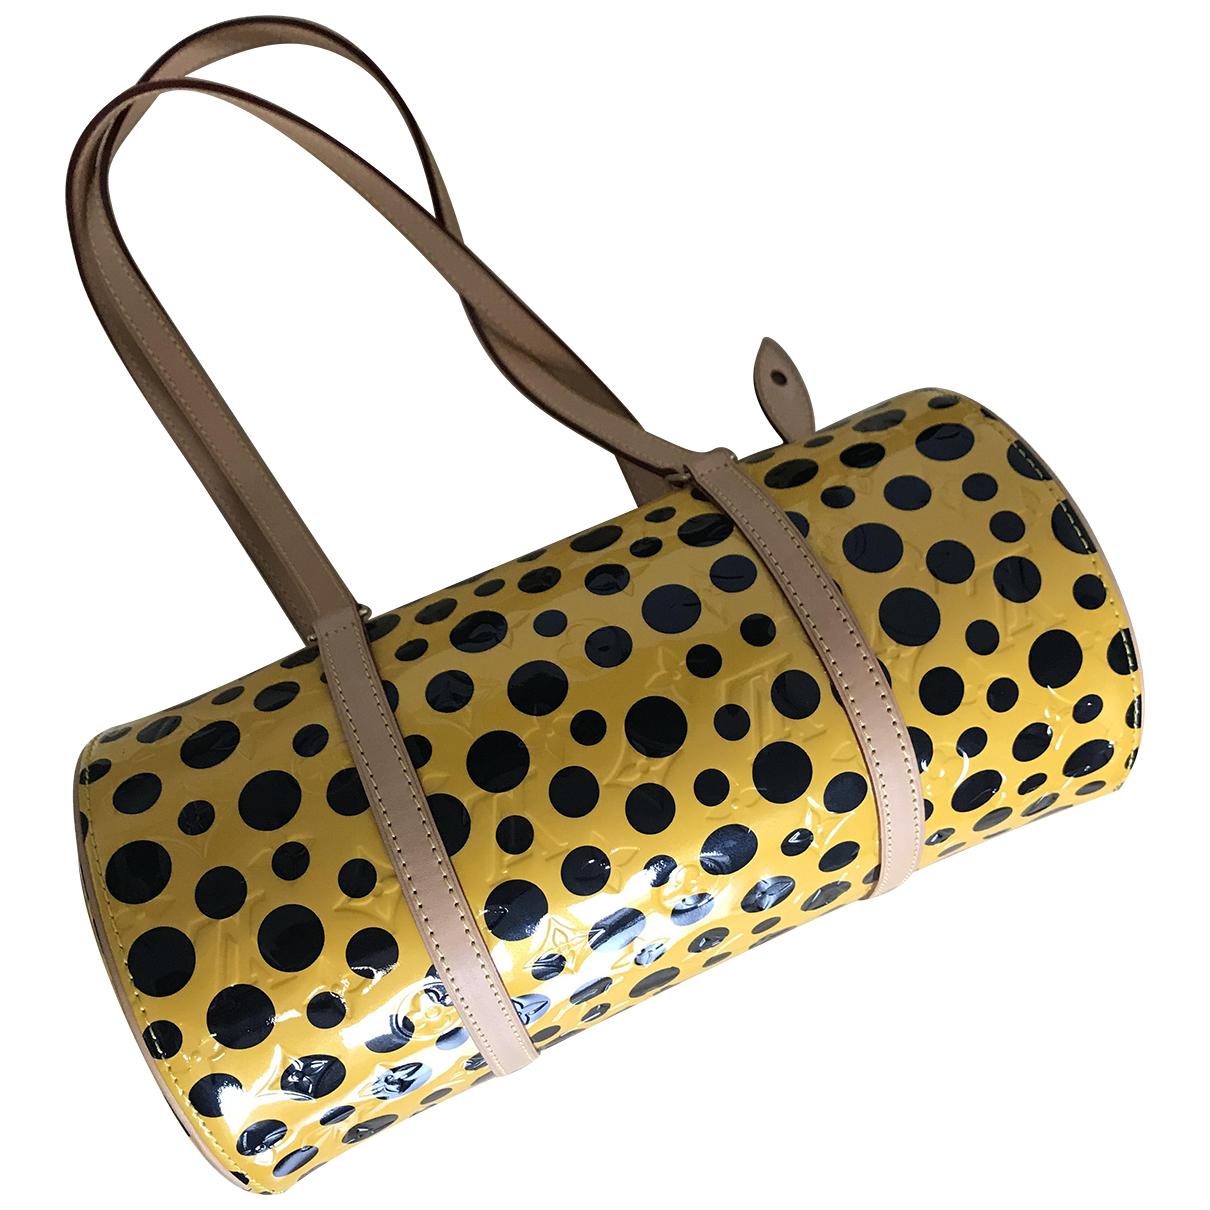 Louis Vuitton Papillon Handtasche in  Gelb Leder